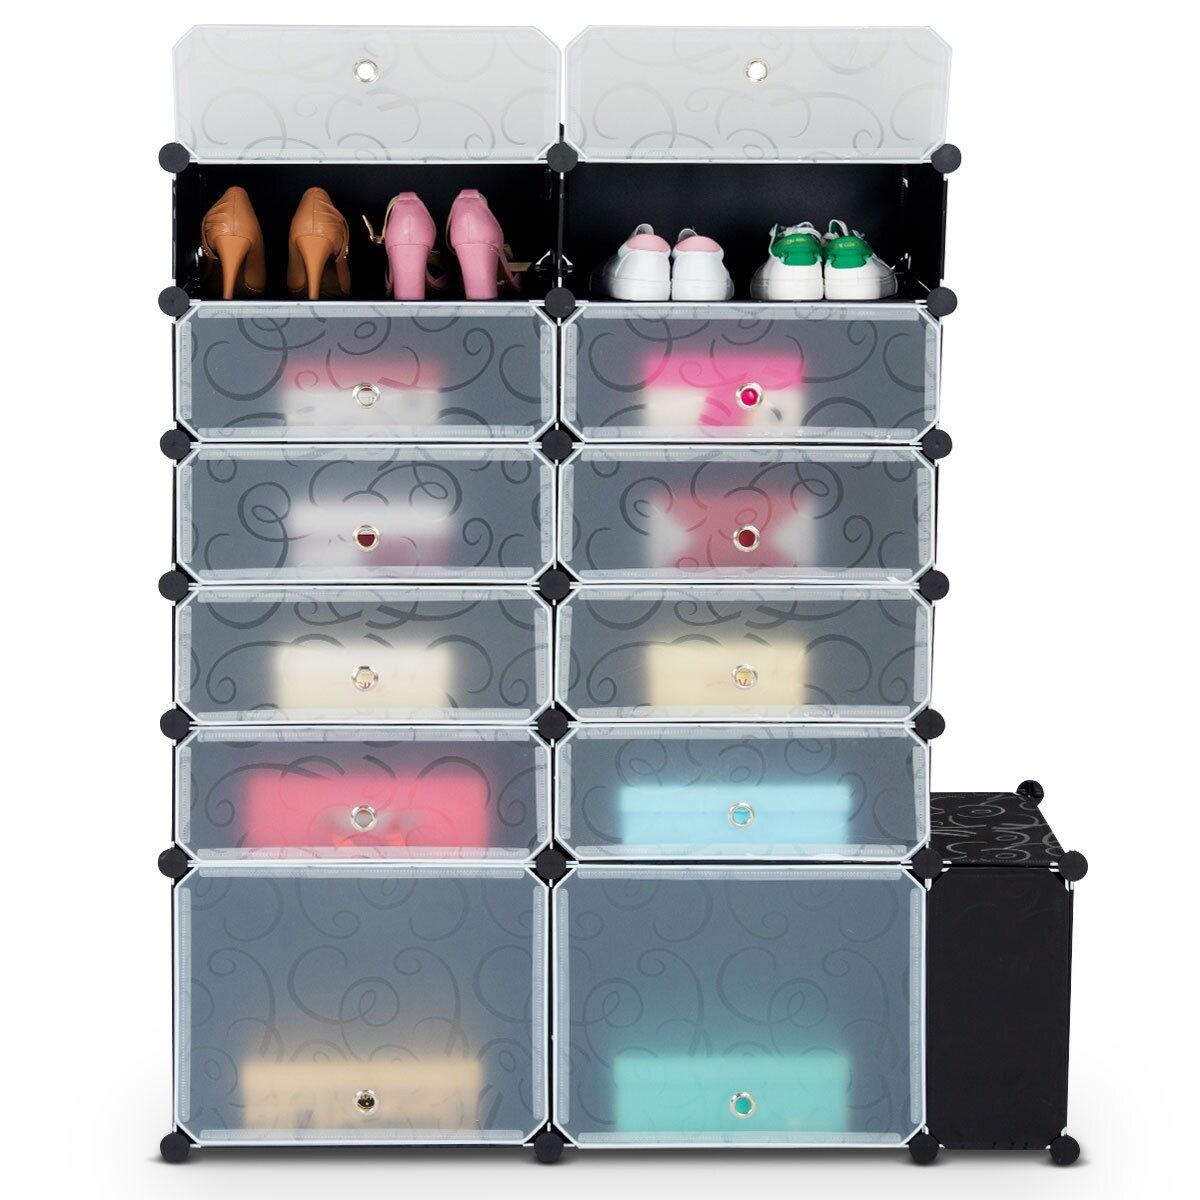 Costway Diy 13 Cube Portable Shoe Rack Storage Cabinet Organizer 24 Pair Space Saving